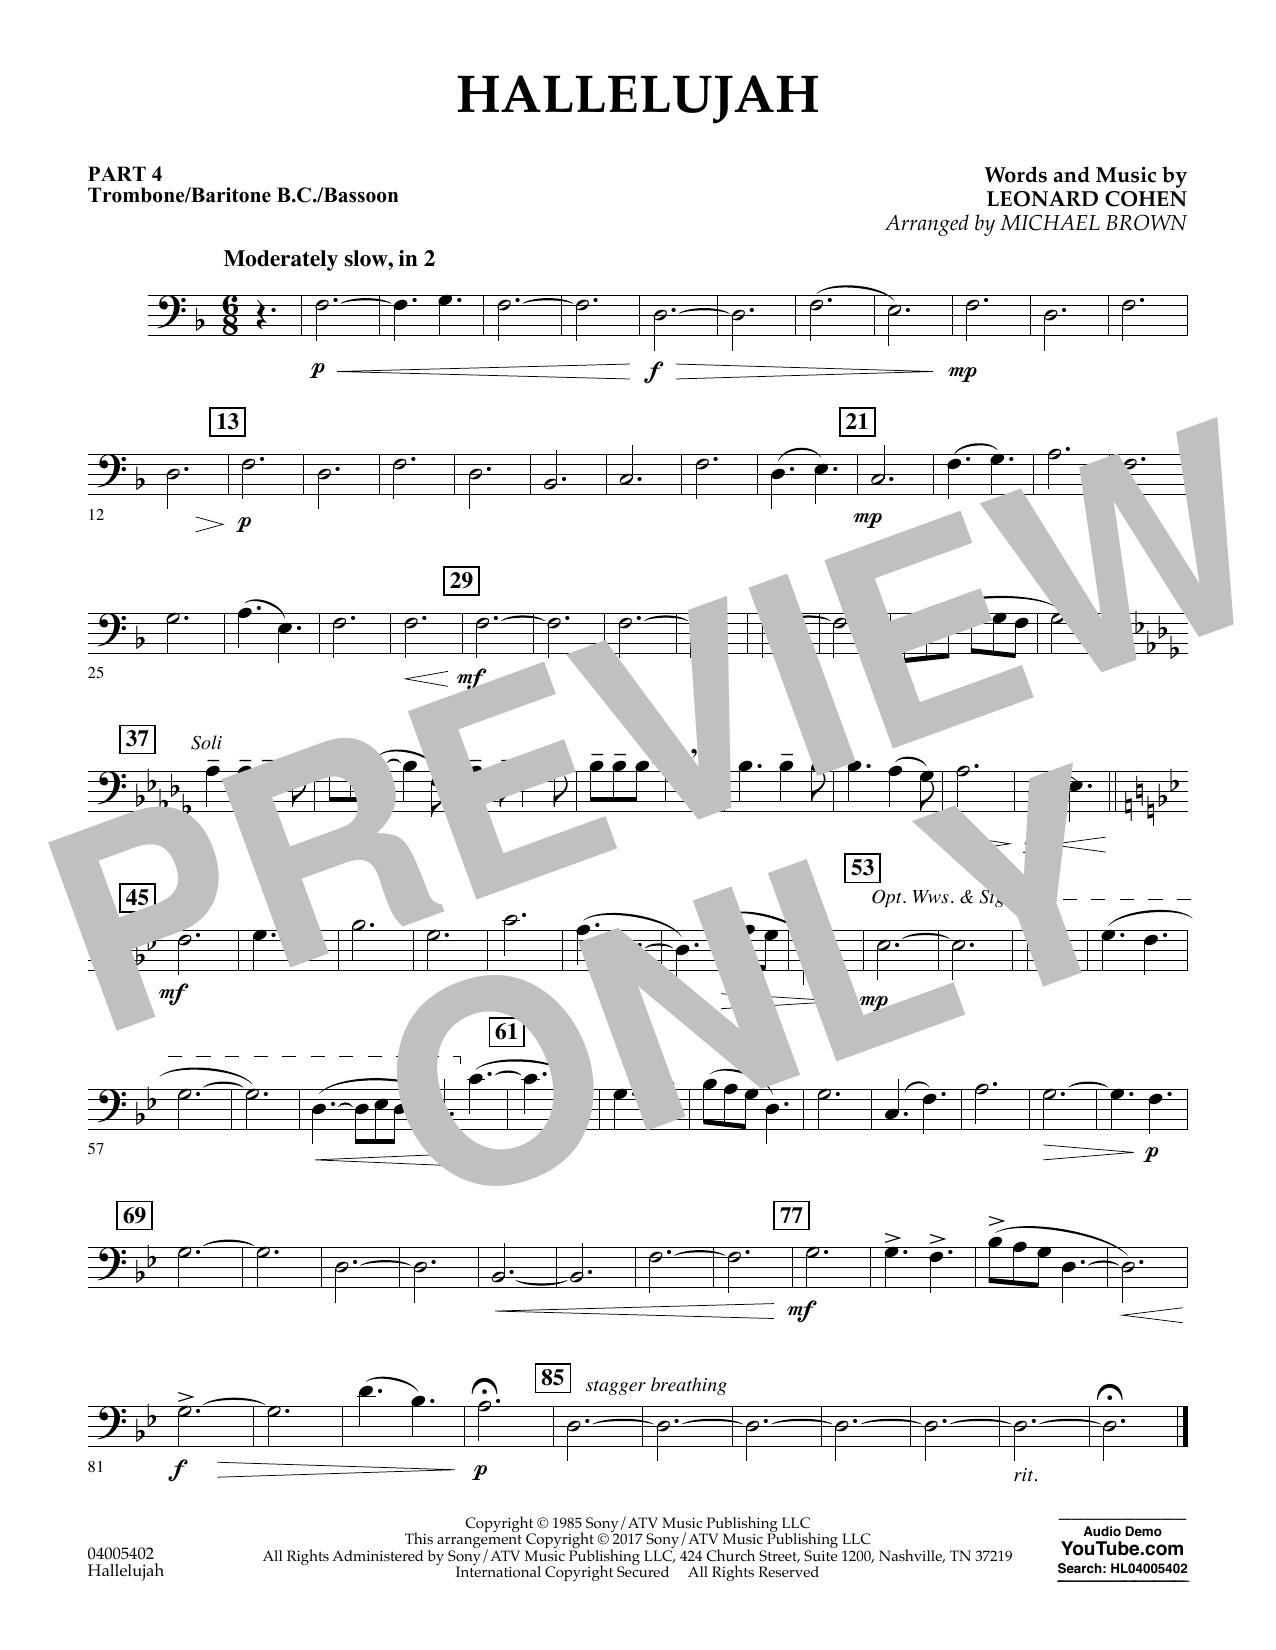 Hallelujah - Pt.4 - Trombone/Bar. B.C./Bsn. Sheet Music